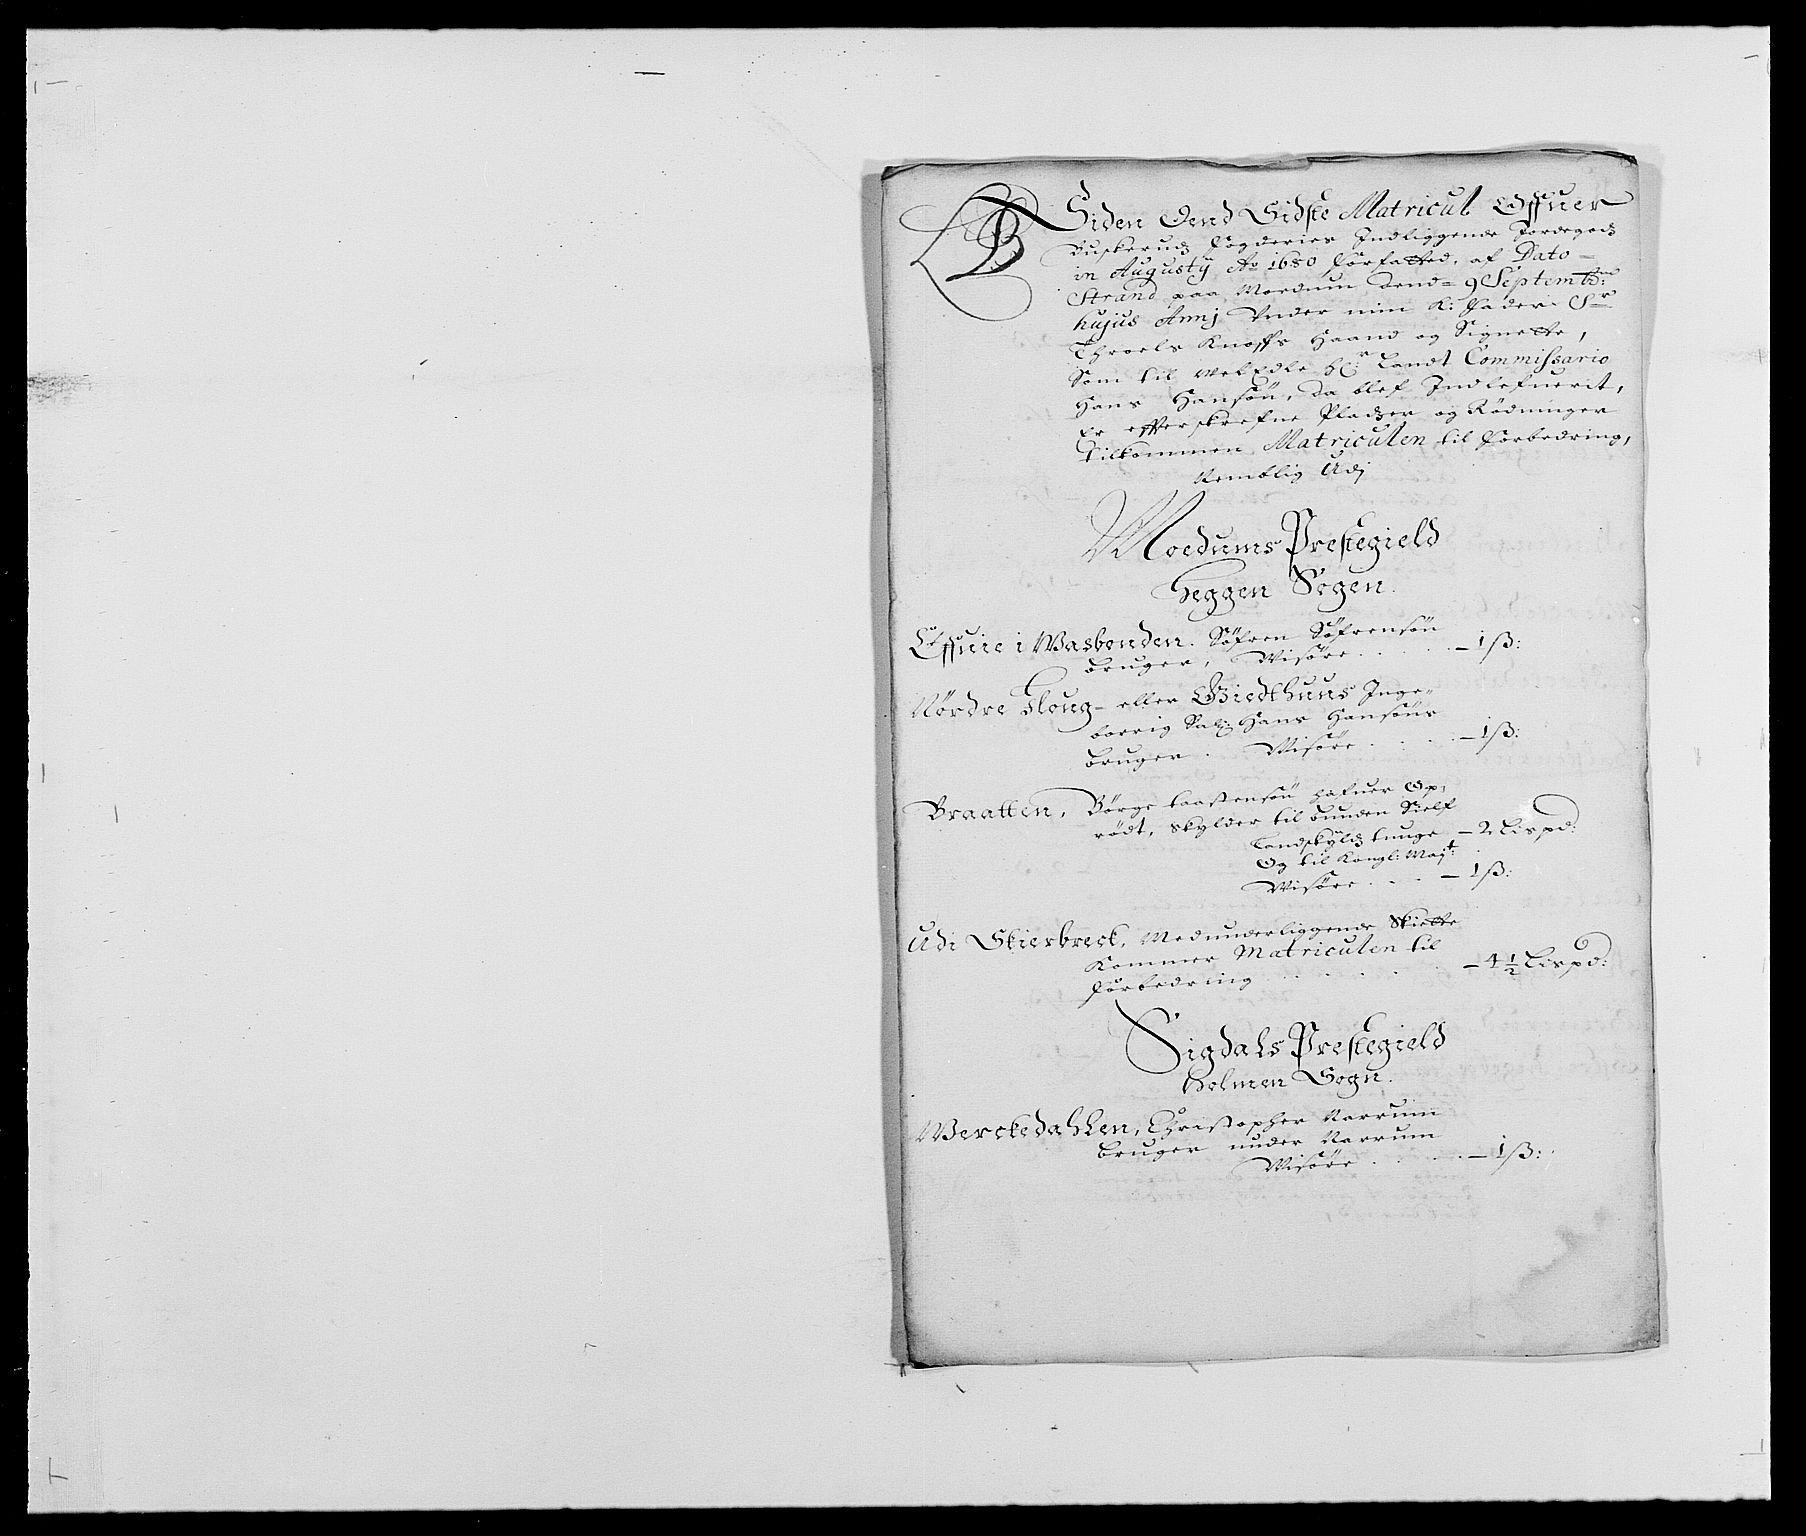 RA, Rentekammeret inntil 1814, Reviderte regnskaper, Fogderegnskap, R25/L1677: Fogderegnskap Buskerud, 1683-1684, s. 23